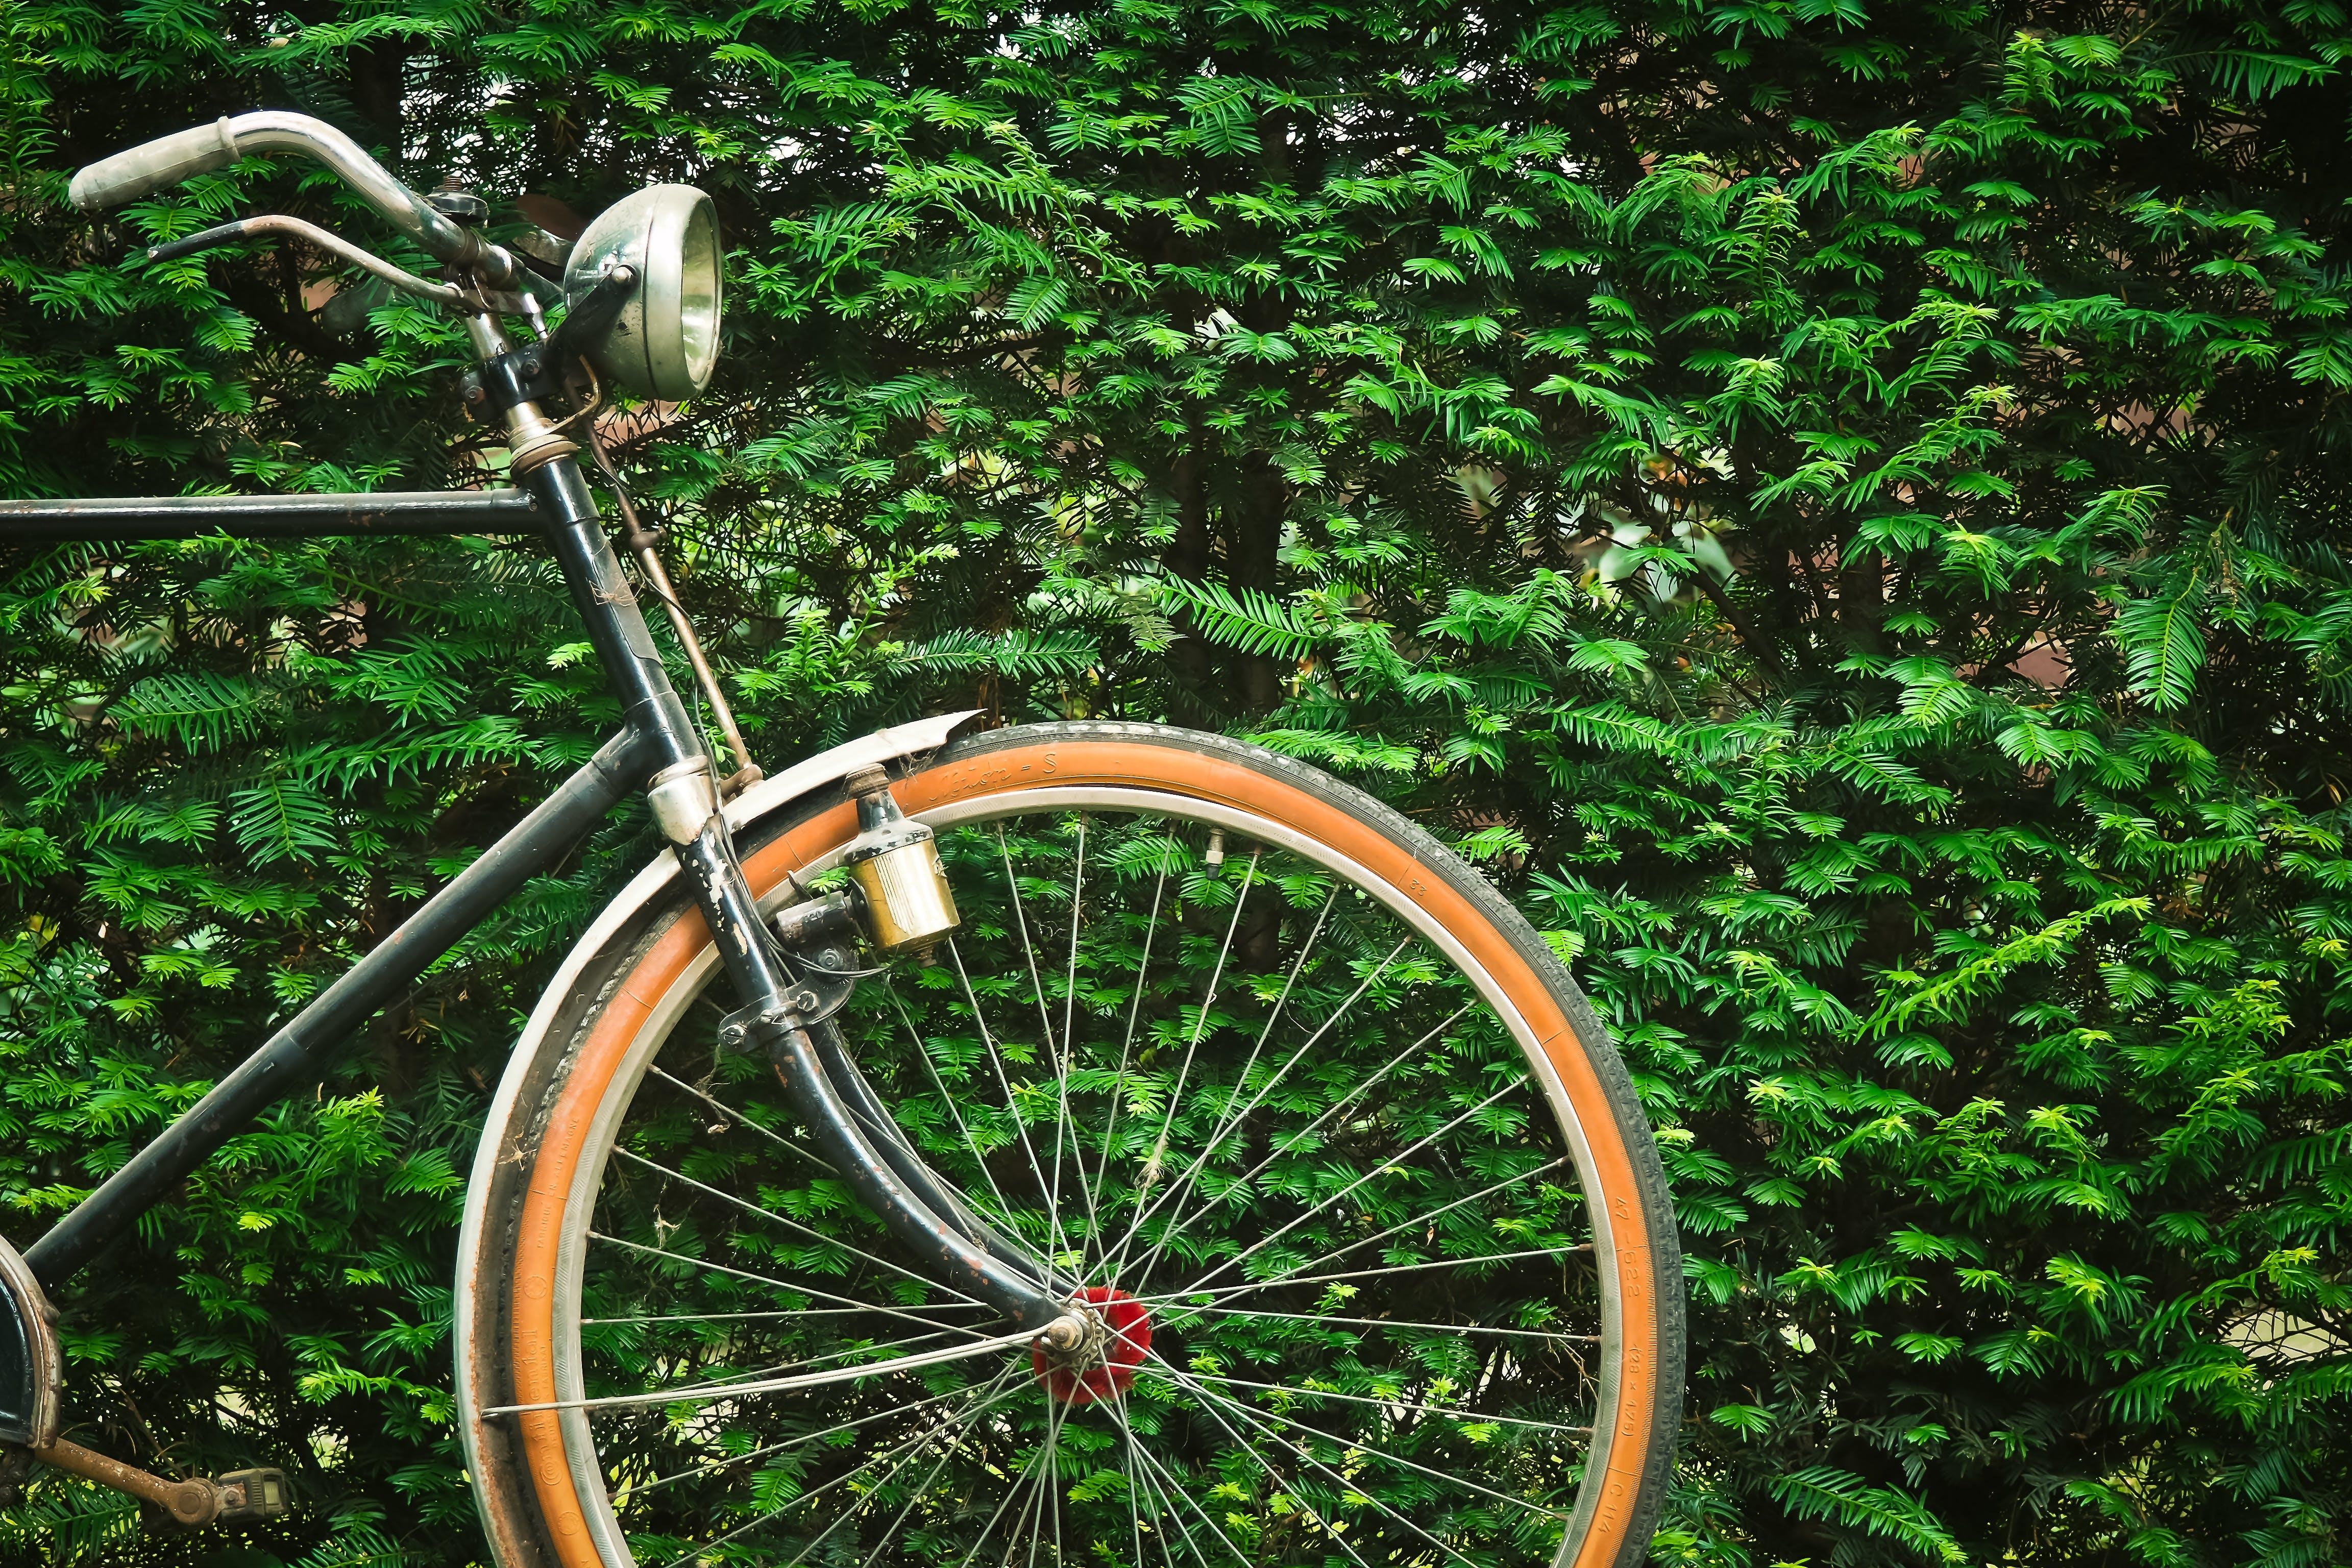 Black Beach Cruiser Bicycle Near Green Hedge during Daytime